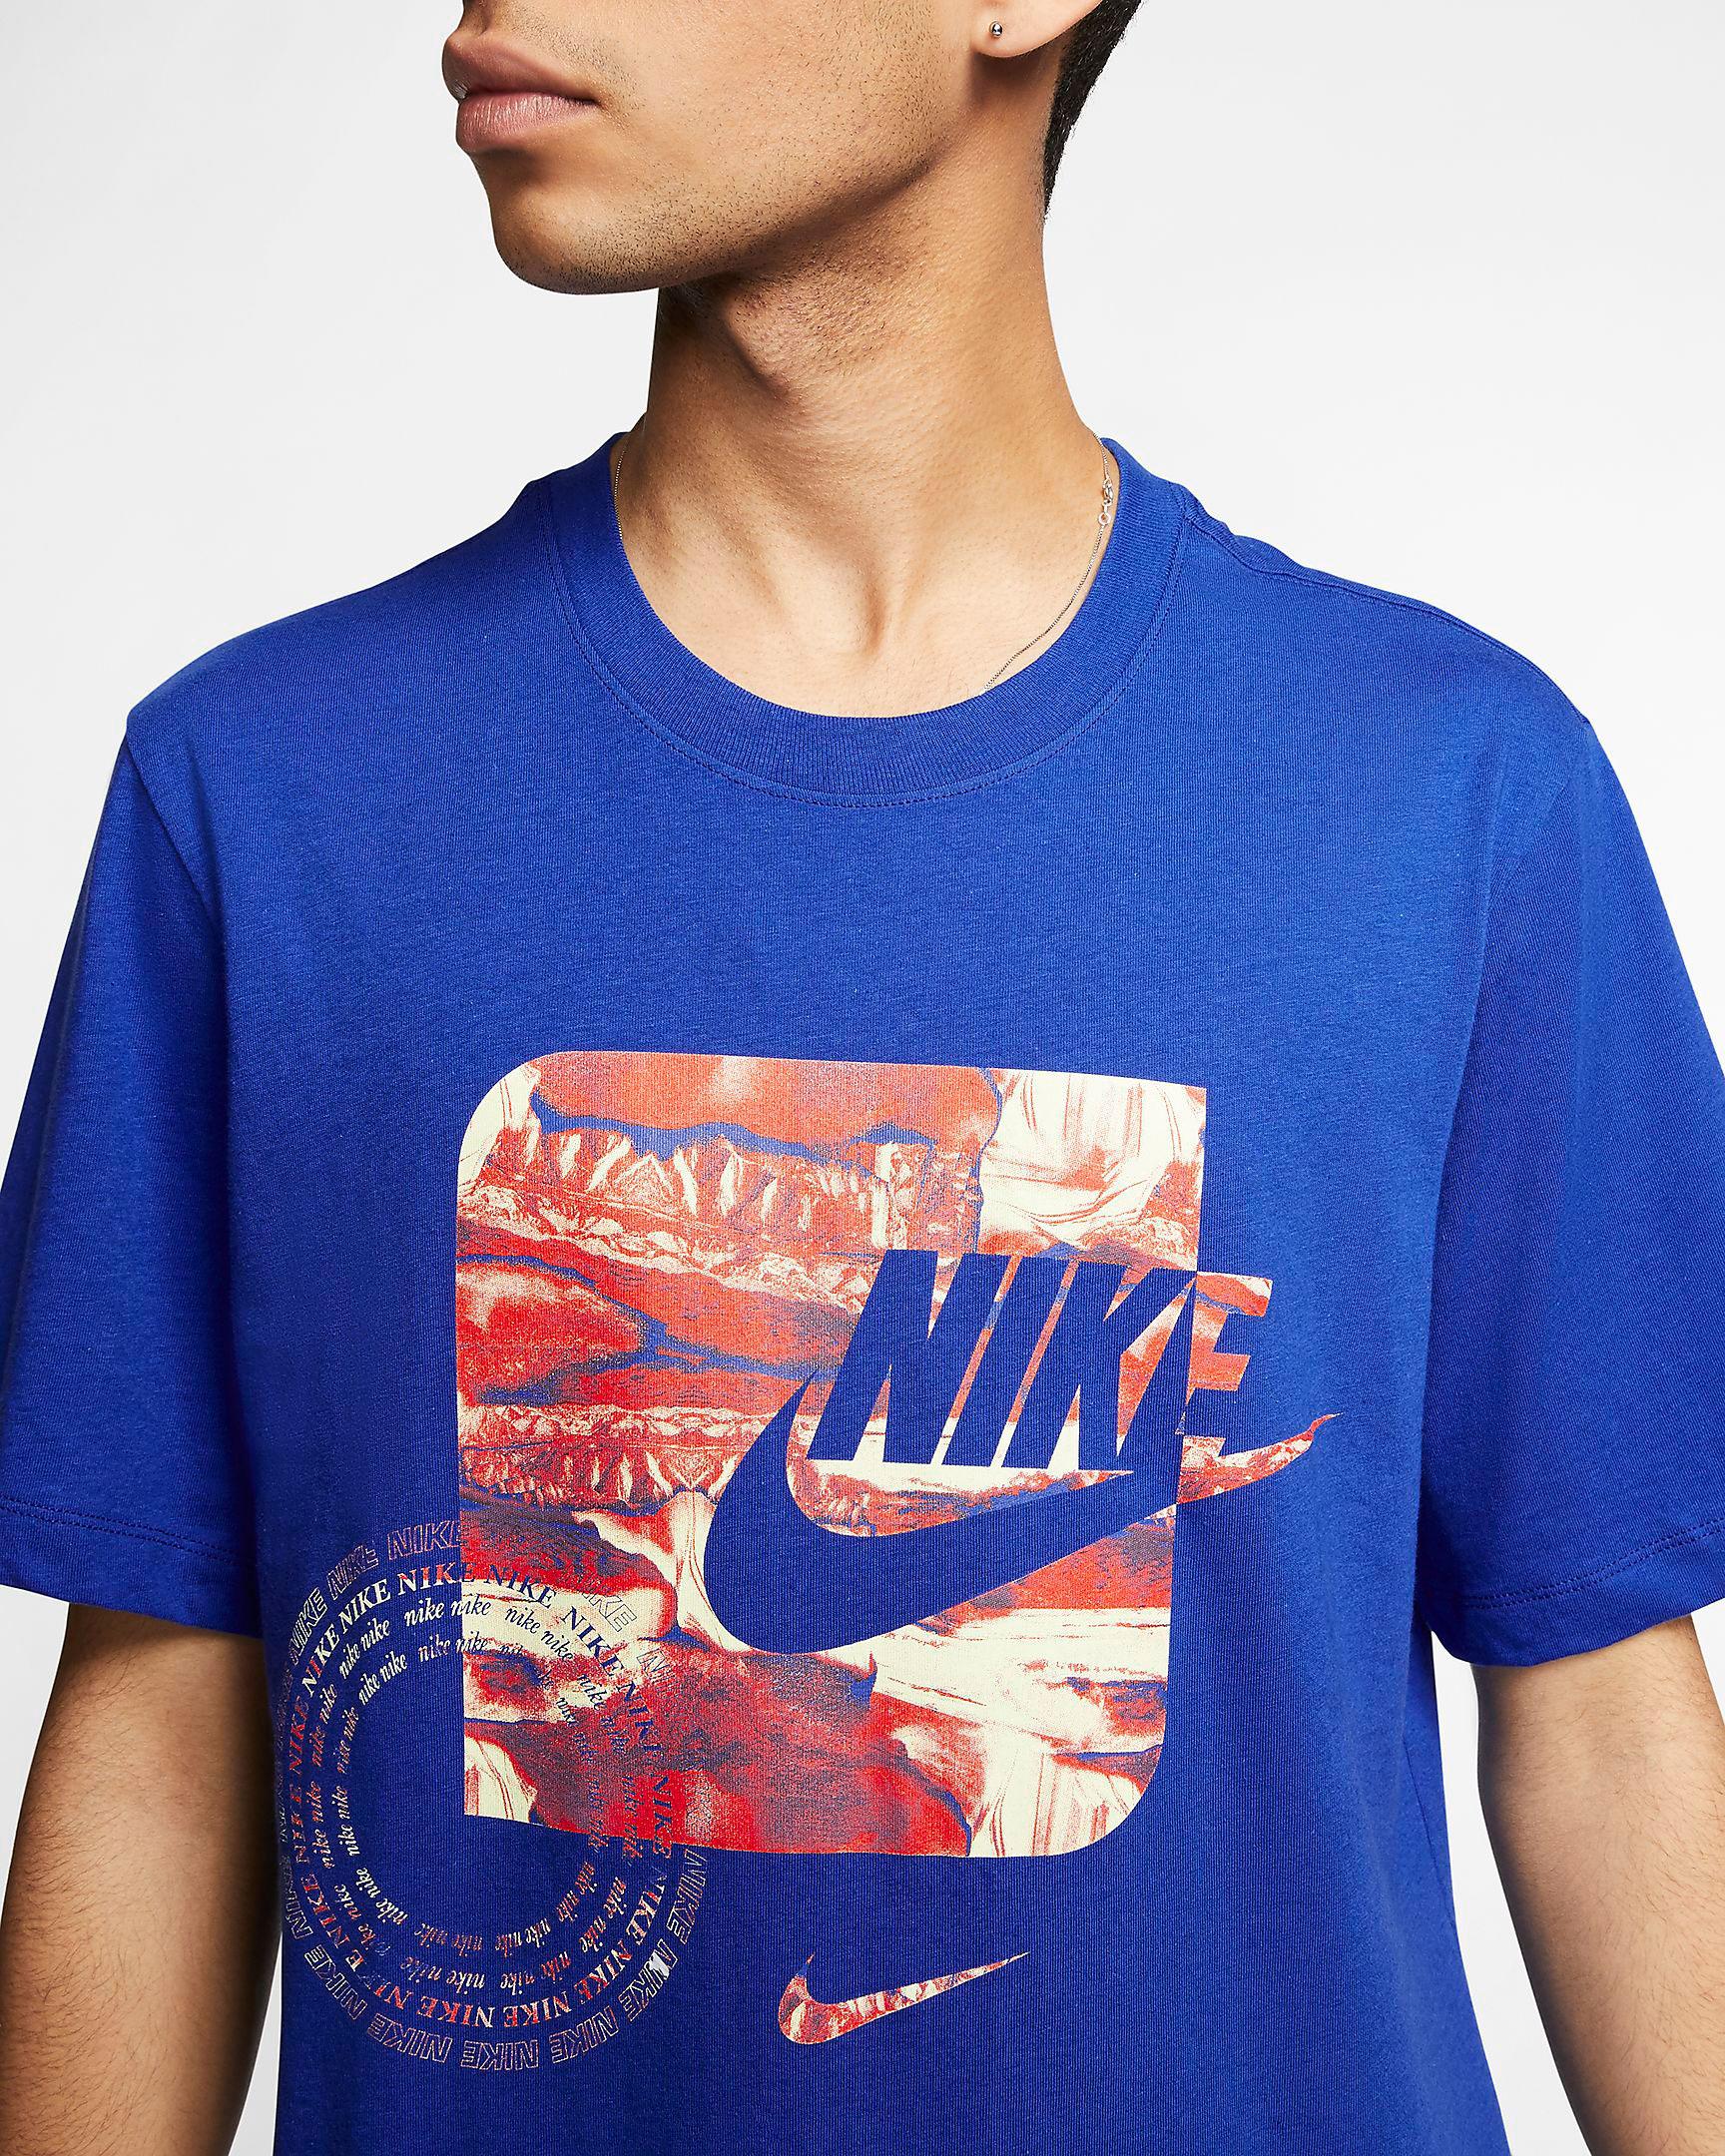 nike-organic-distortion-shirt-blue